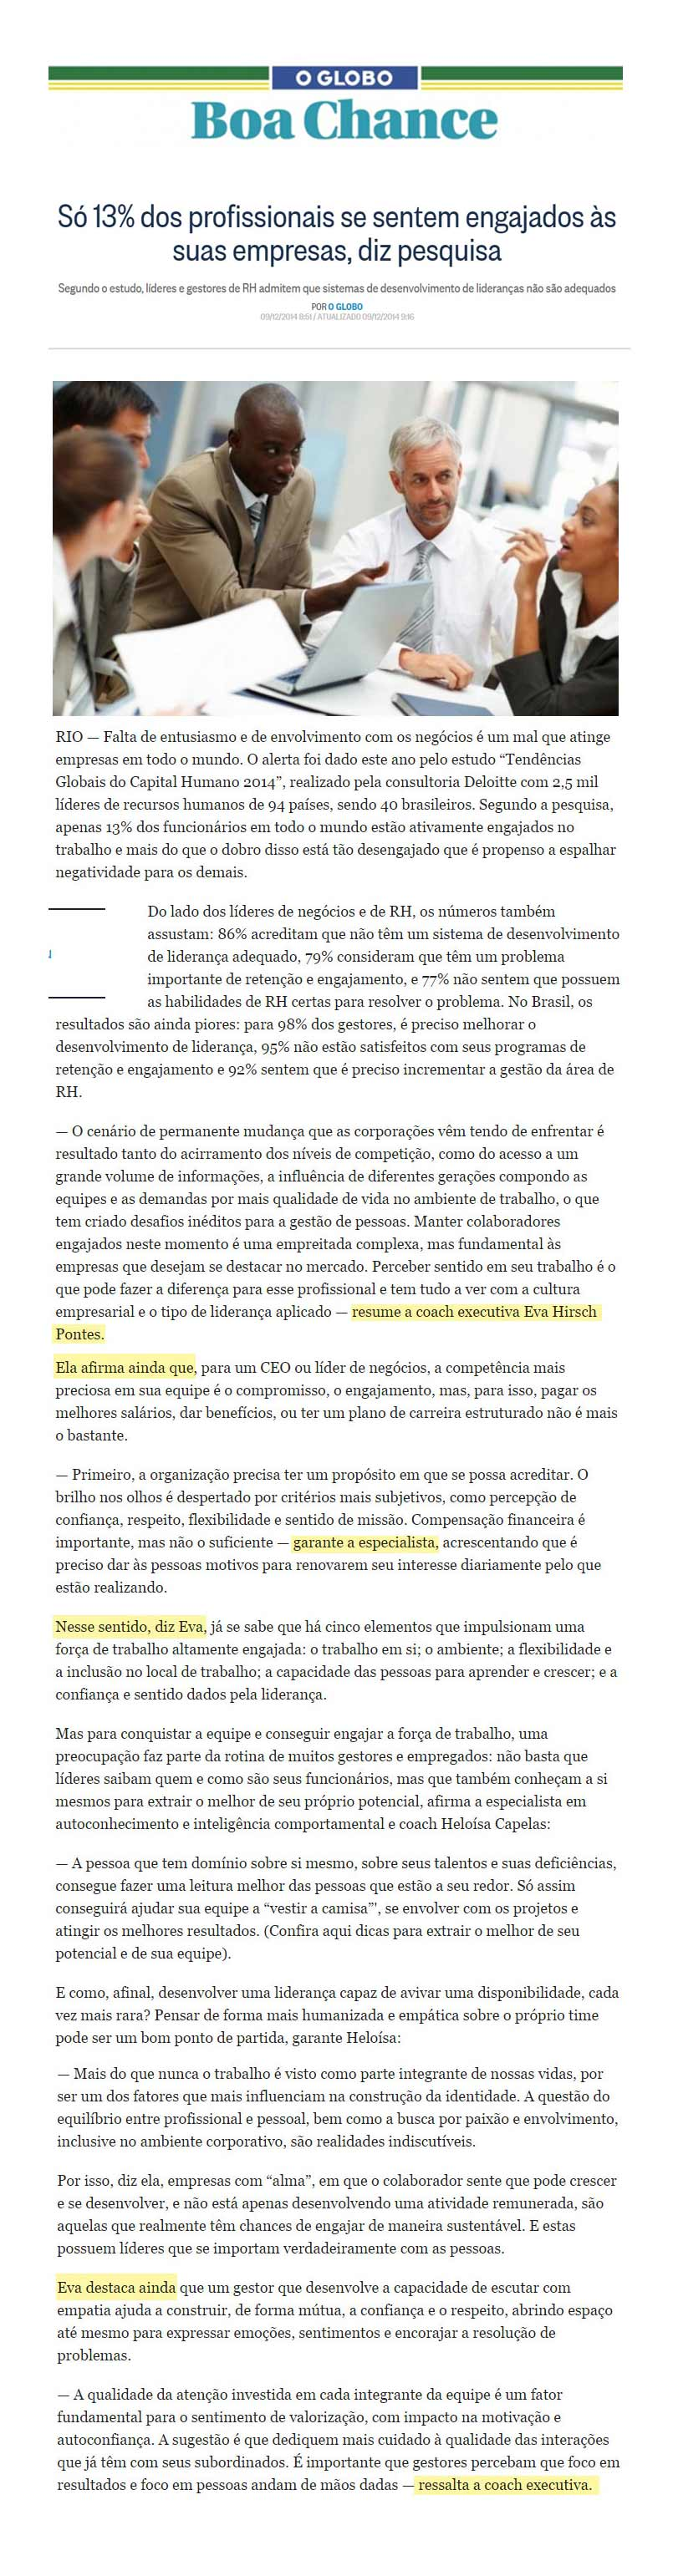 Portal-O-Globo_Boa-Chance_9.12-Site-EVA